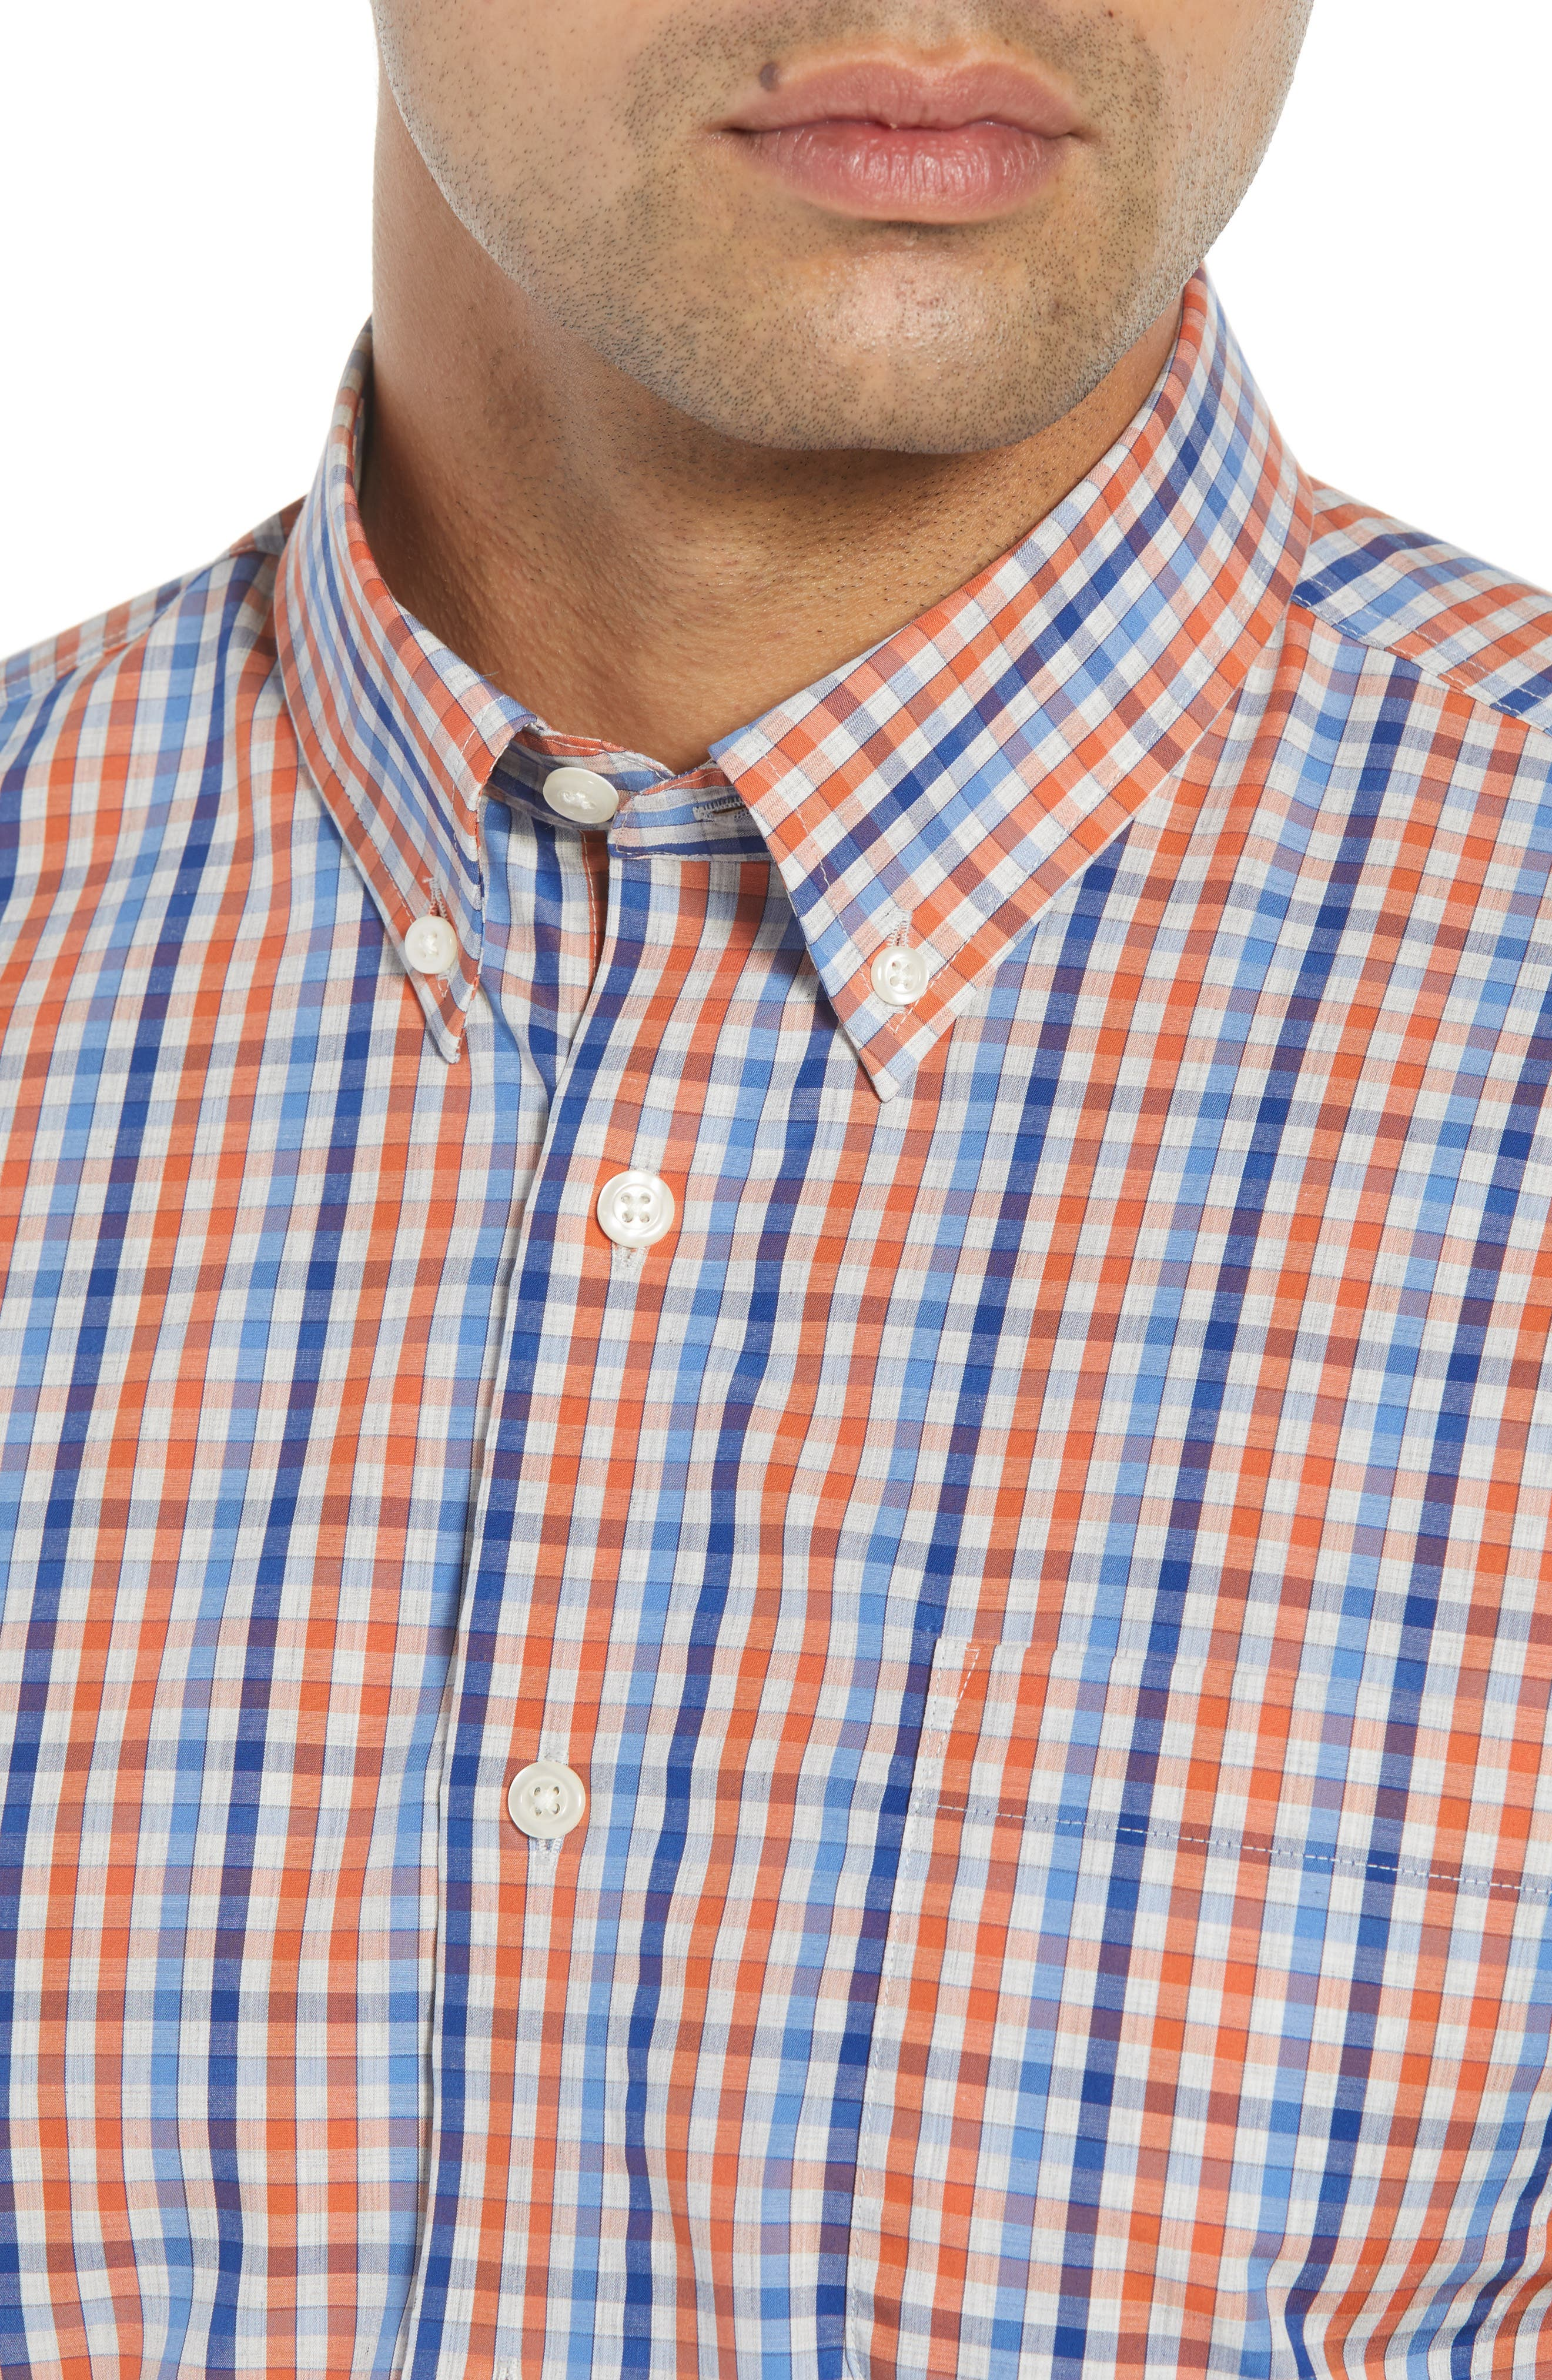 Rawlings Classic Fit Sport Shirt,                             Alternate thumbnail 2, color,                             MARINER